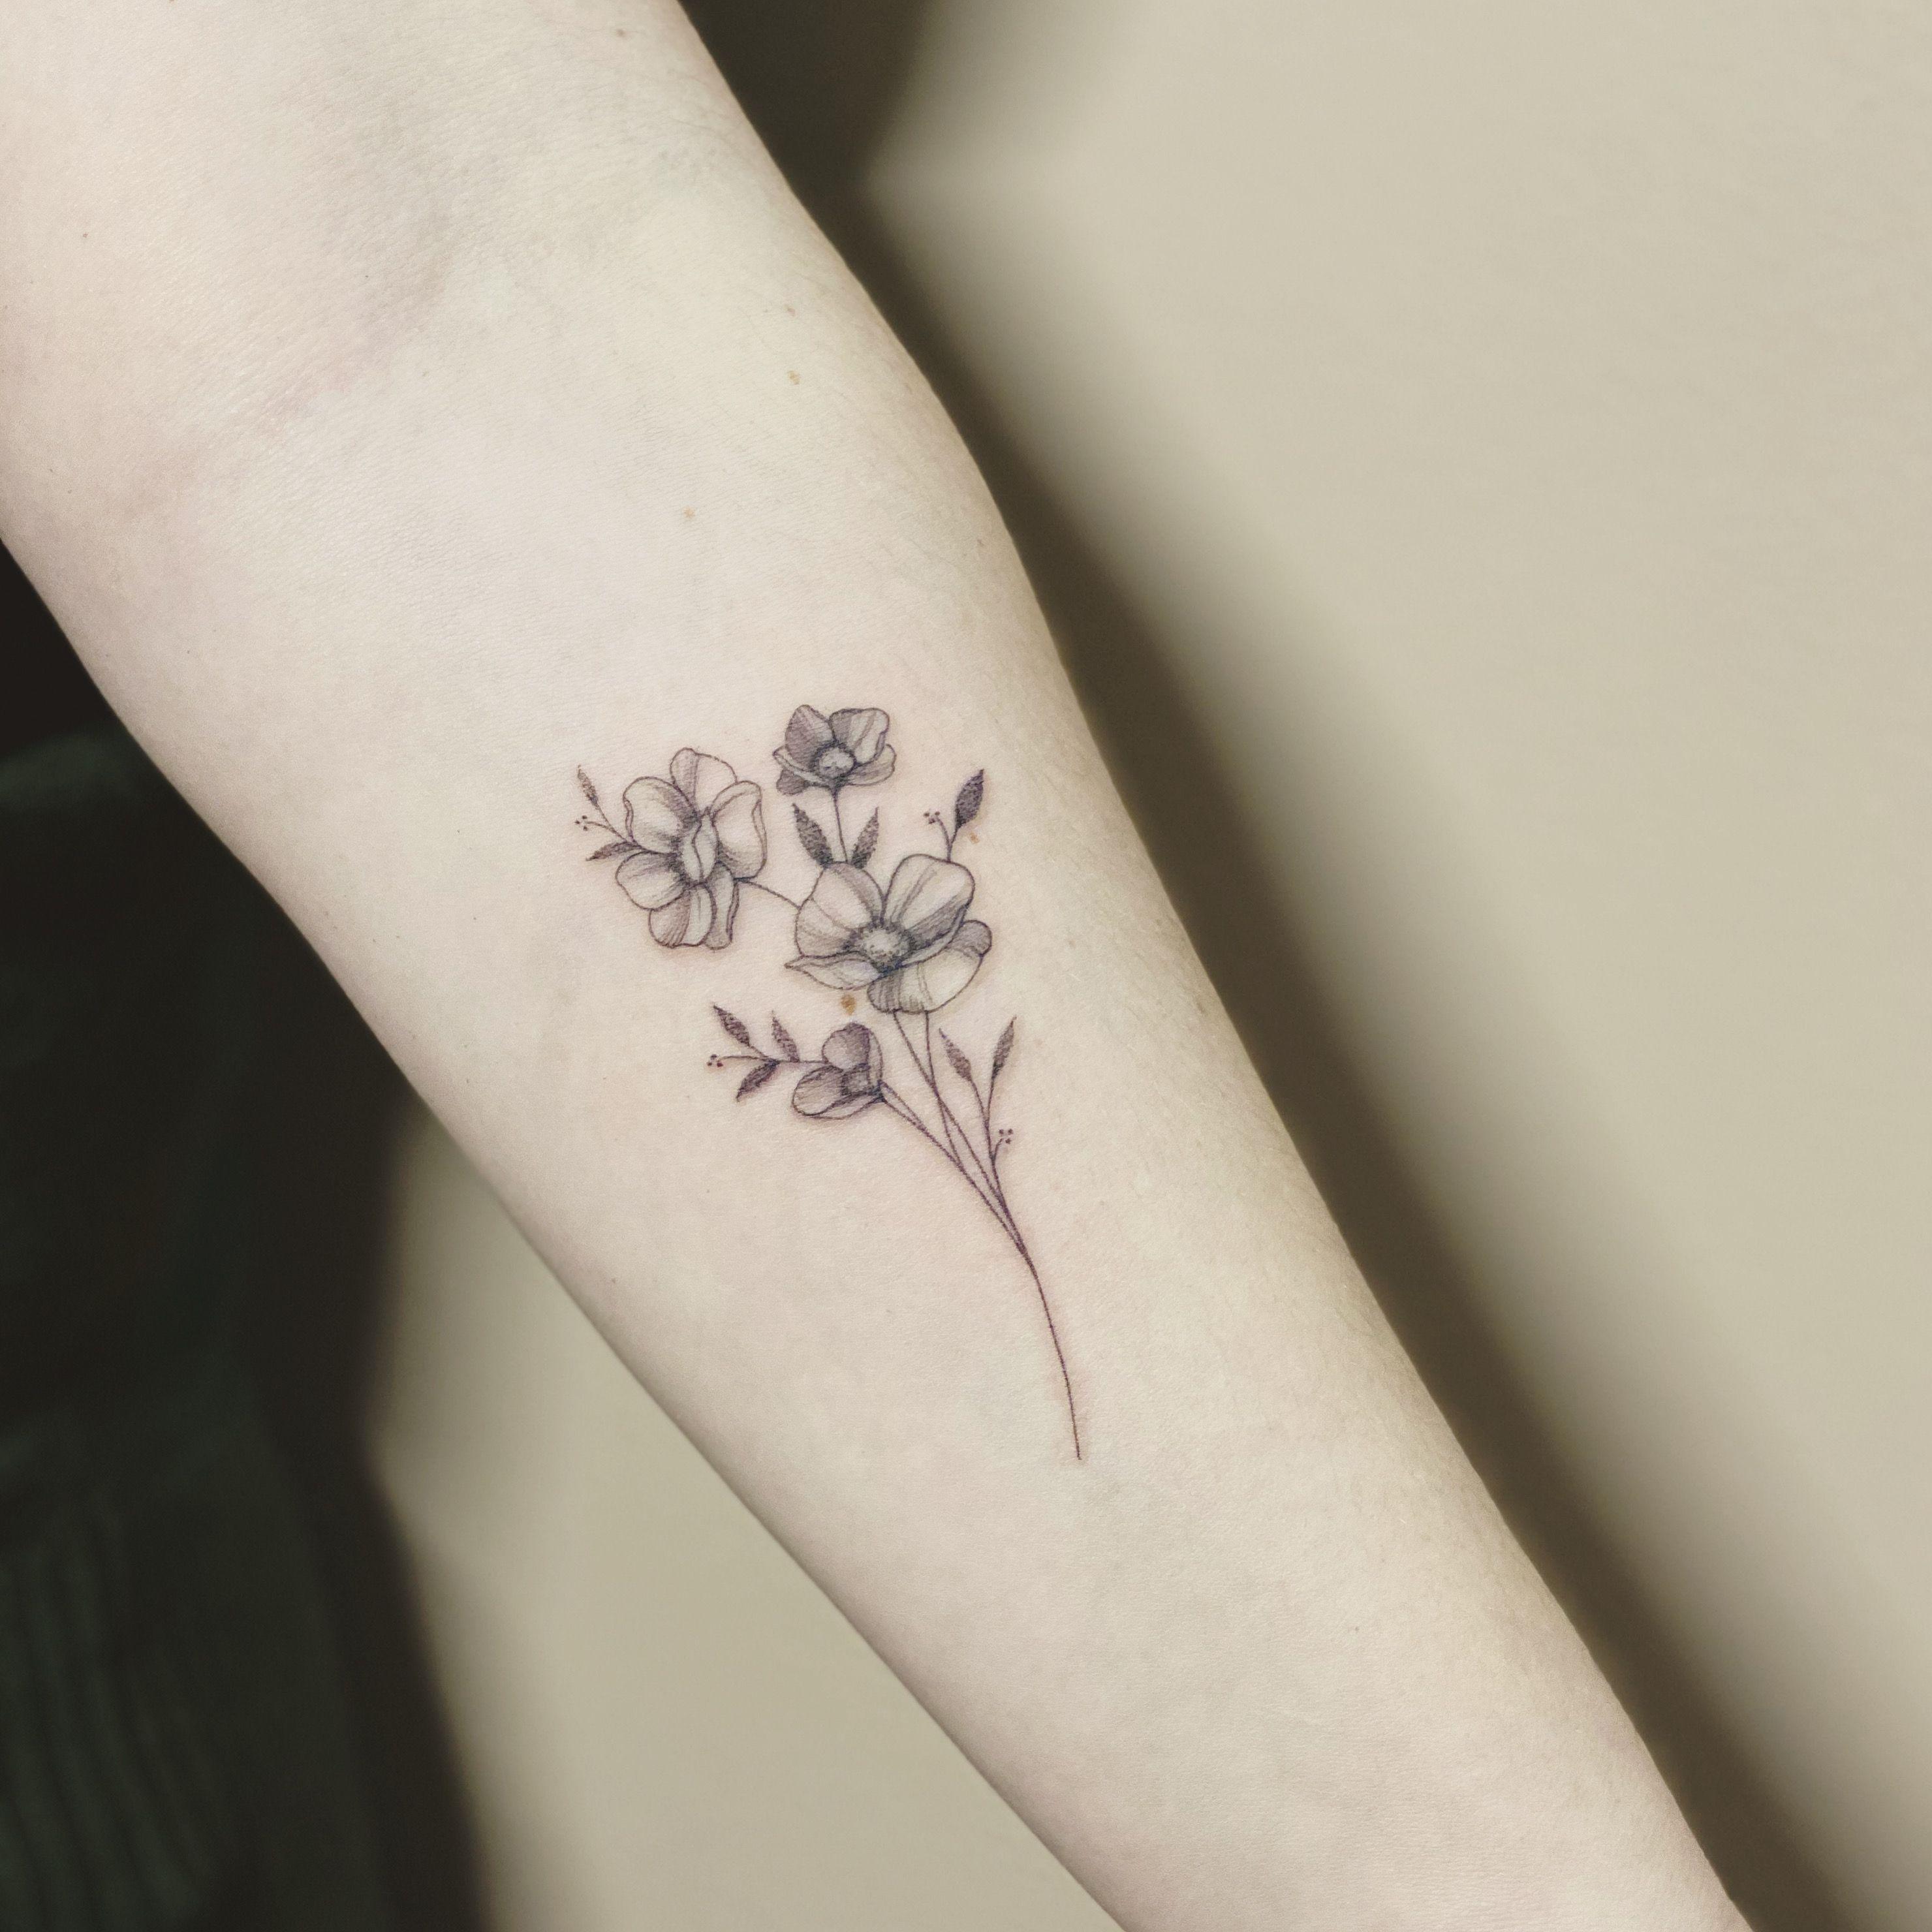 #firsttattoo #flowertattoo done @physalistattoo 🌹 #tattoo #fineline #fineliner #tats #tattooparis #paris #ink #inked #instaink #inkedlife #instagram #tattoofloralparis #singleneedle #tattoofloral #paristattoo #instatattoo #instainked  #tatouee #tatouage  #flowertattoo #carinsilvertattoo